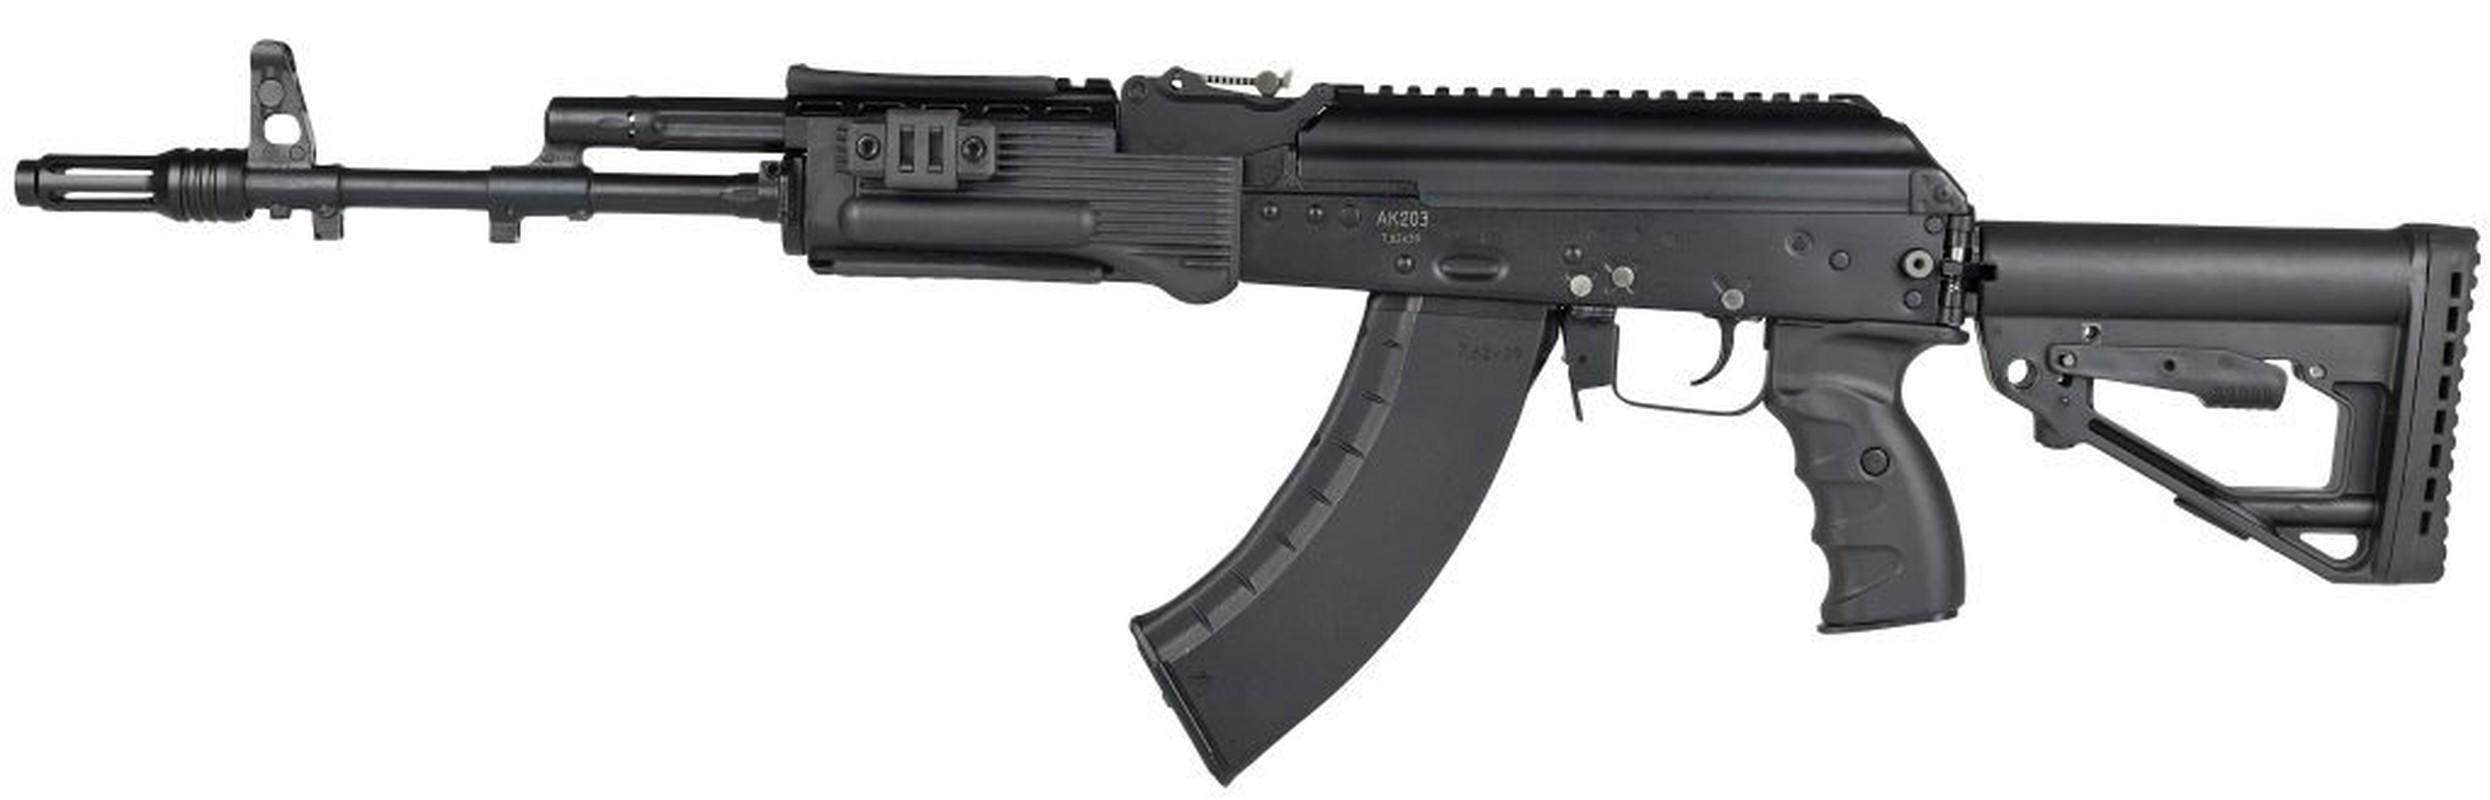 Afghanistan khien An Do yeu cau Nga cung cap khan mot lo AK-203-Hinh-11